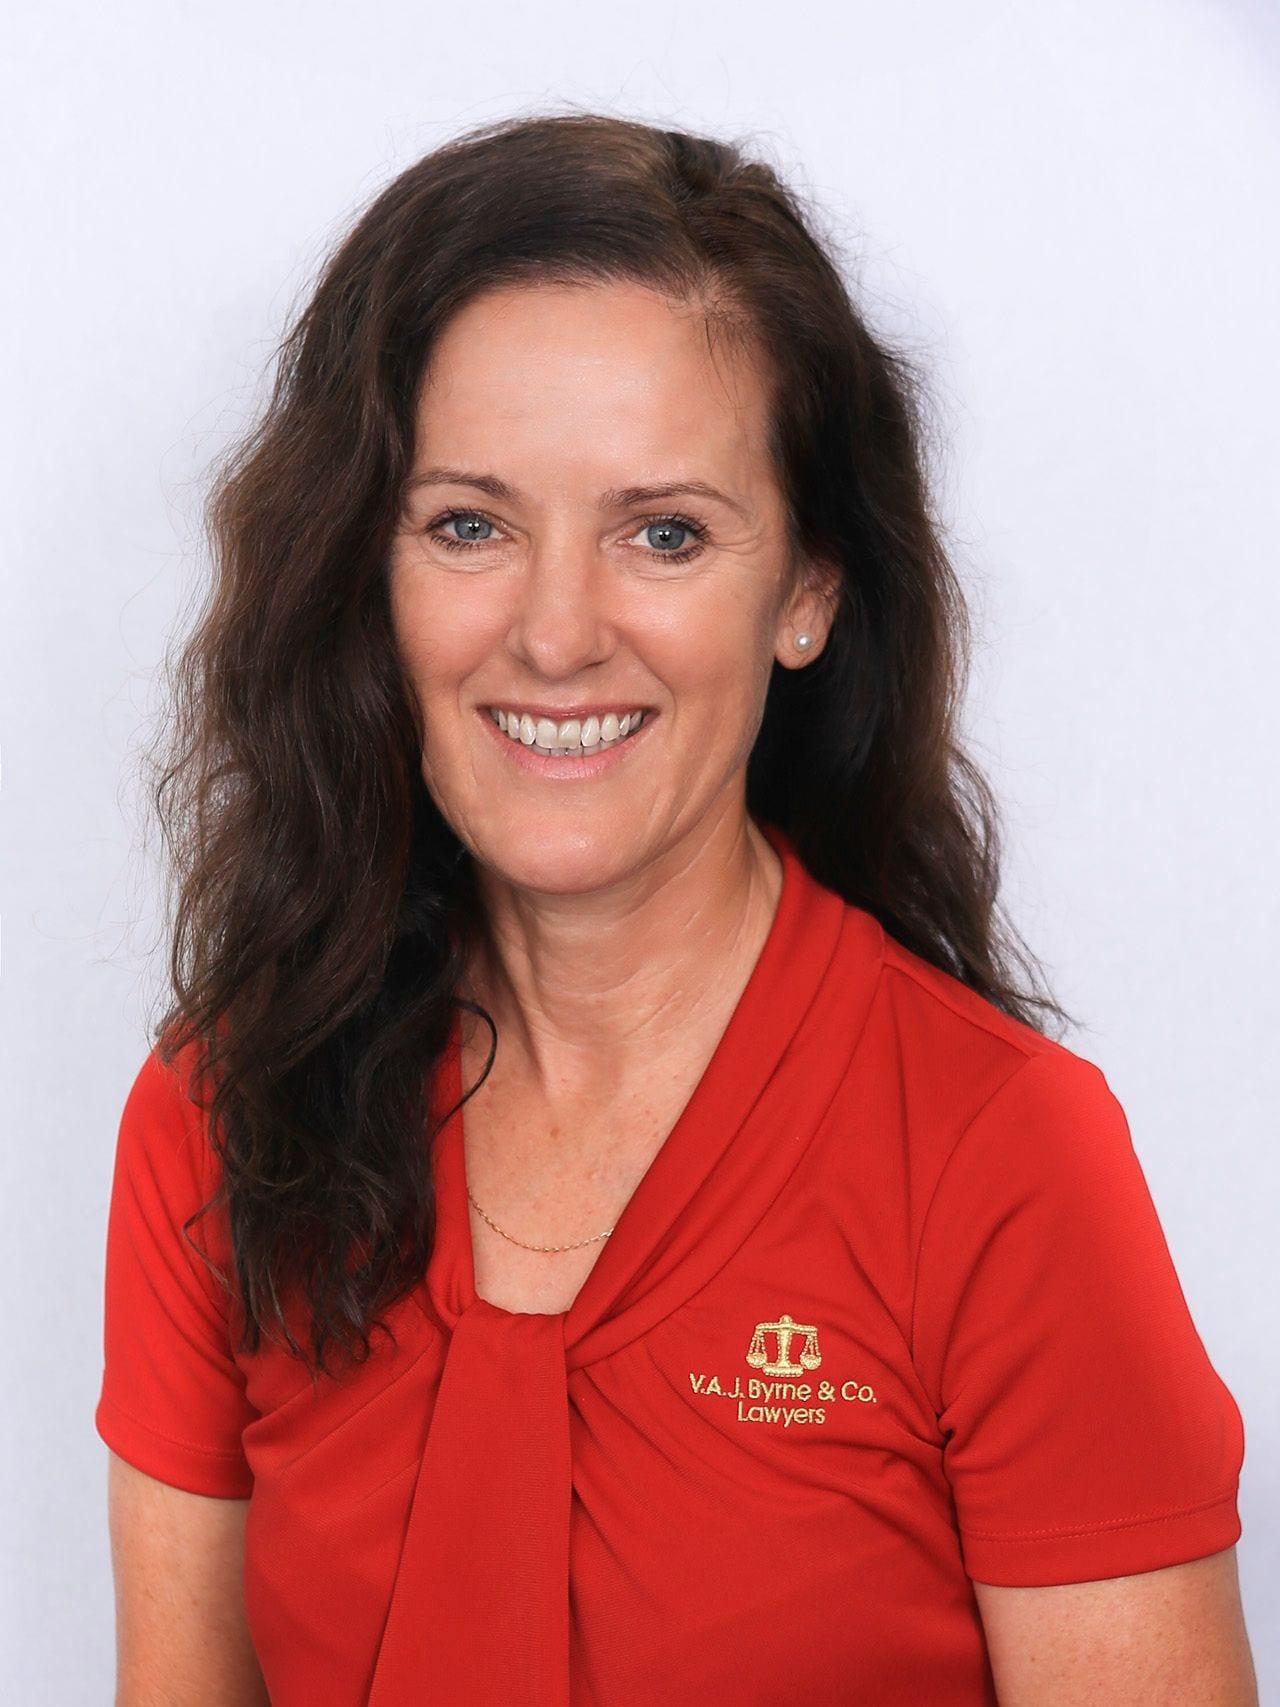 Teresa Platten